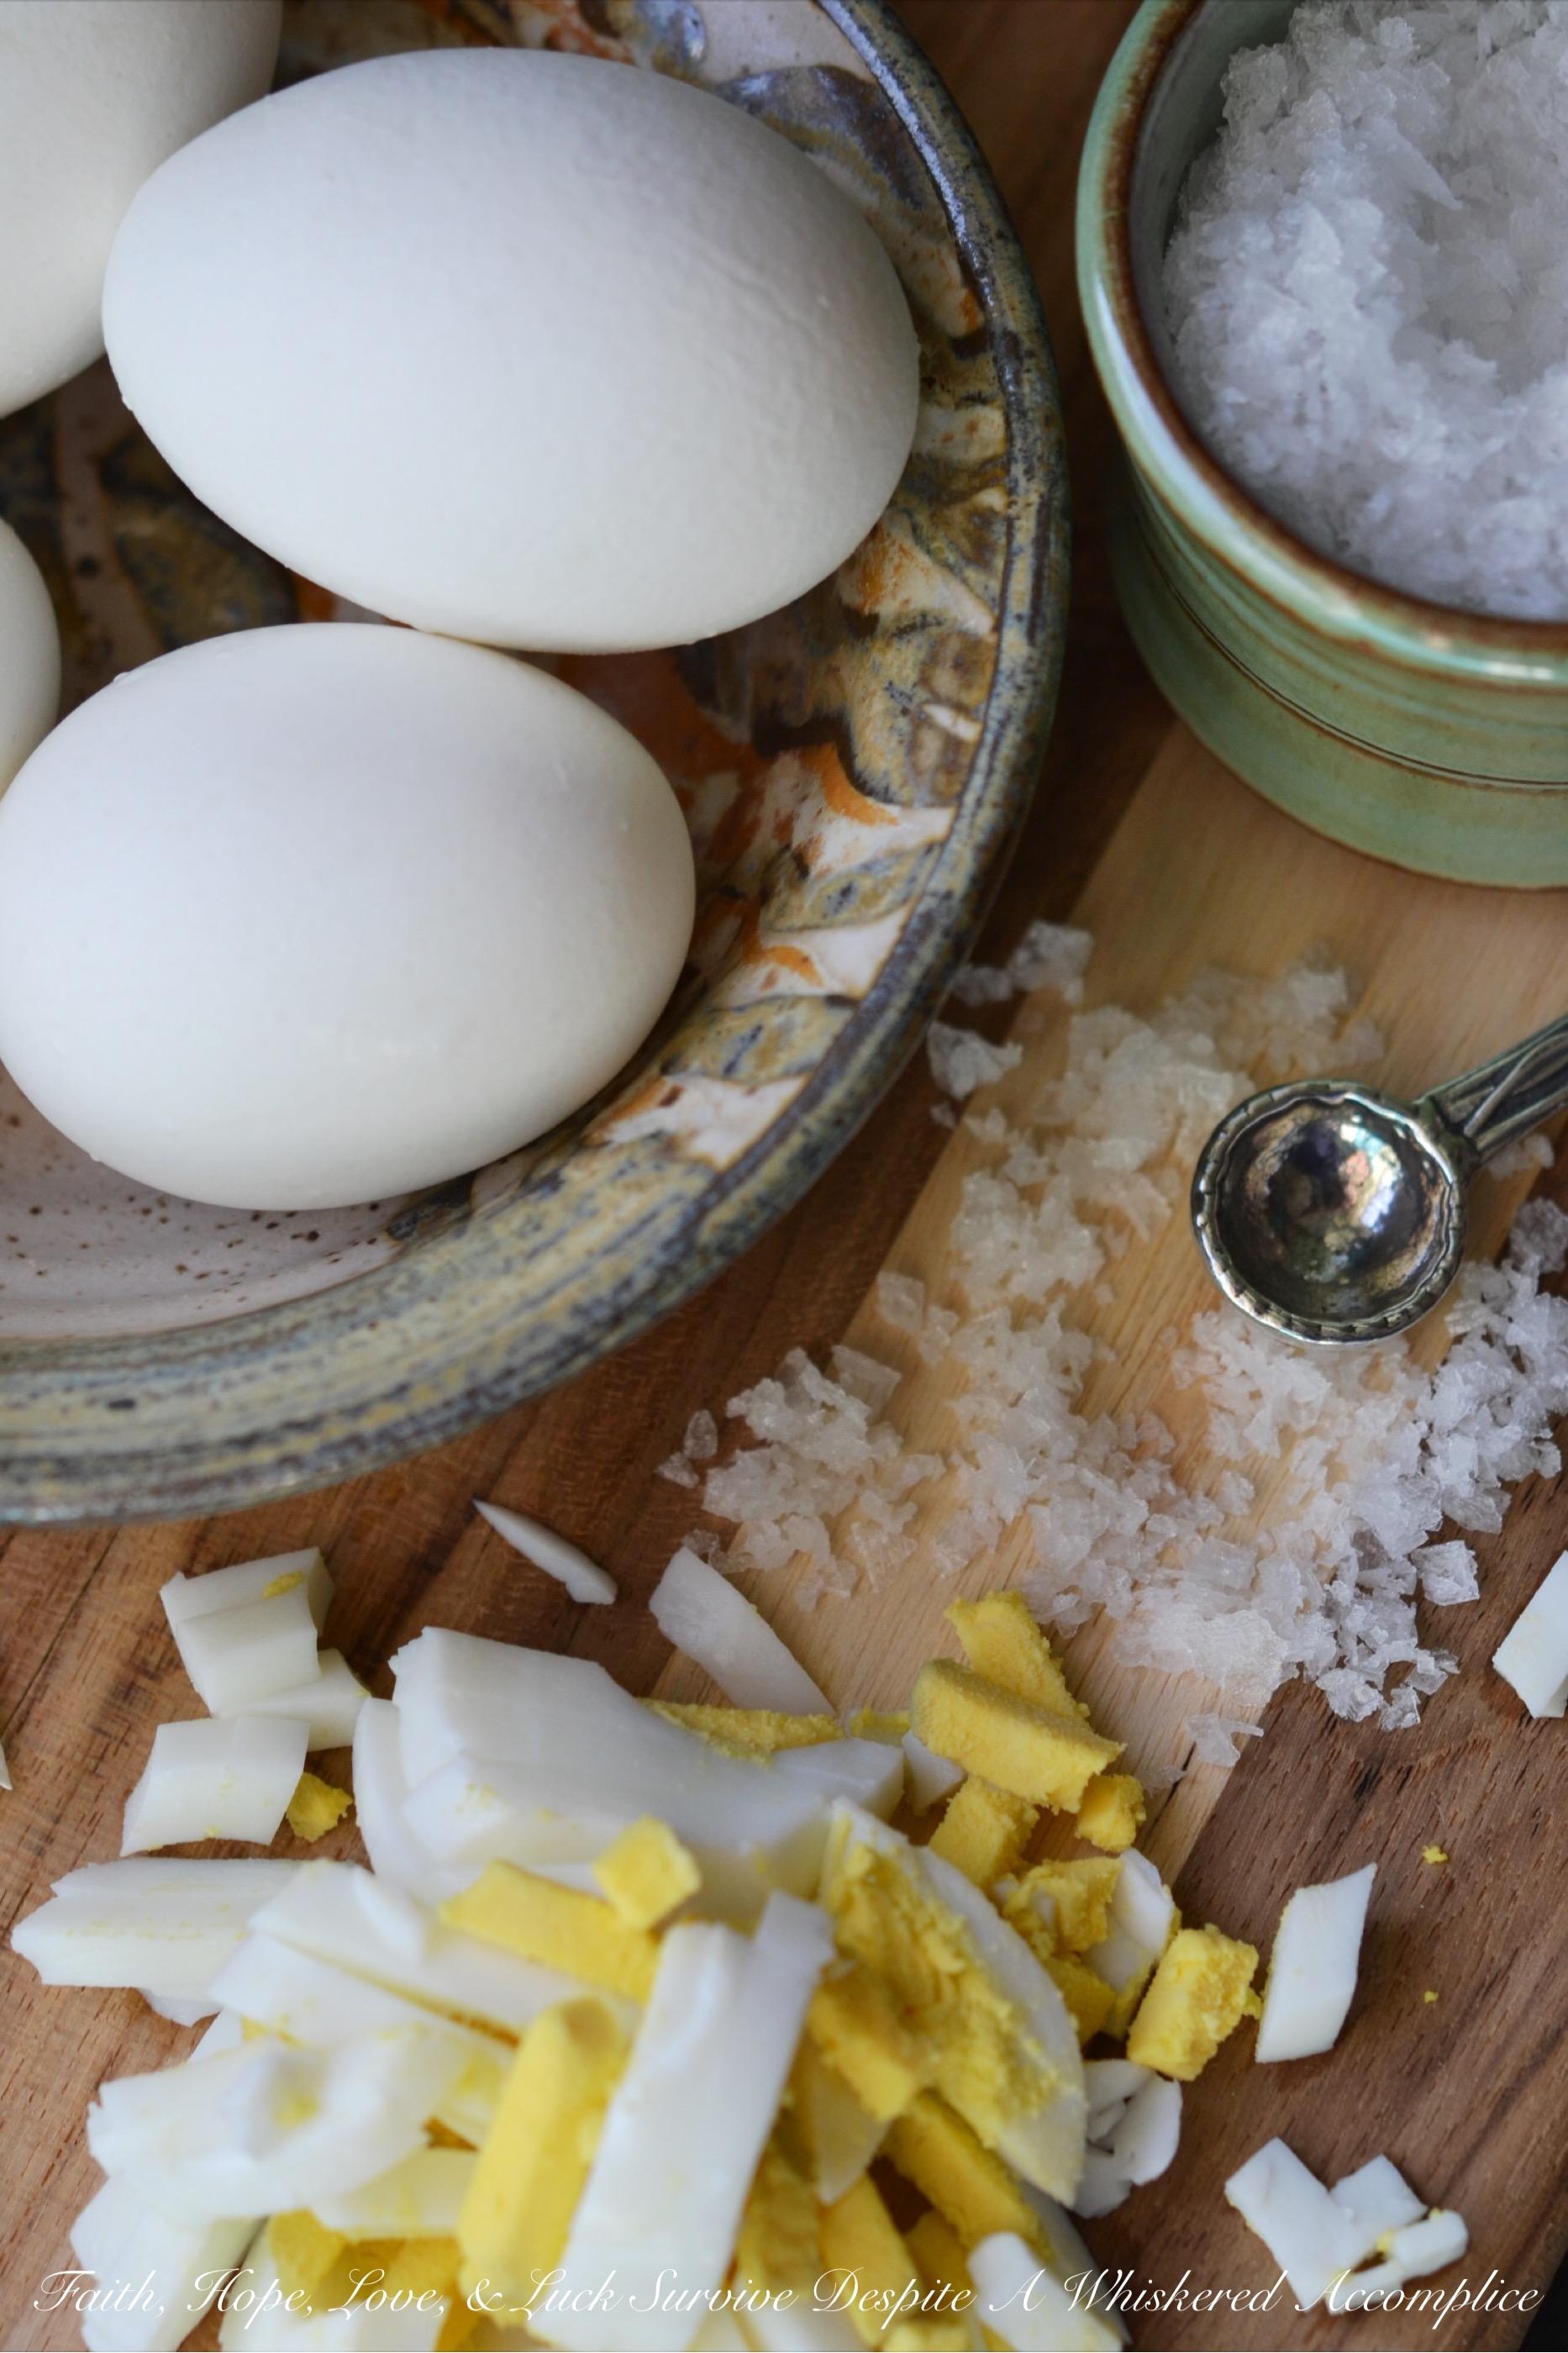 Crockpot Hard-Boiled Eggs